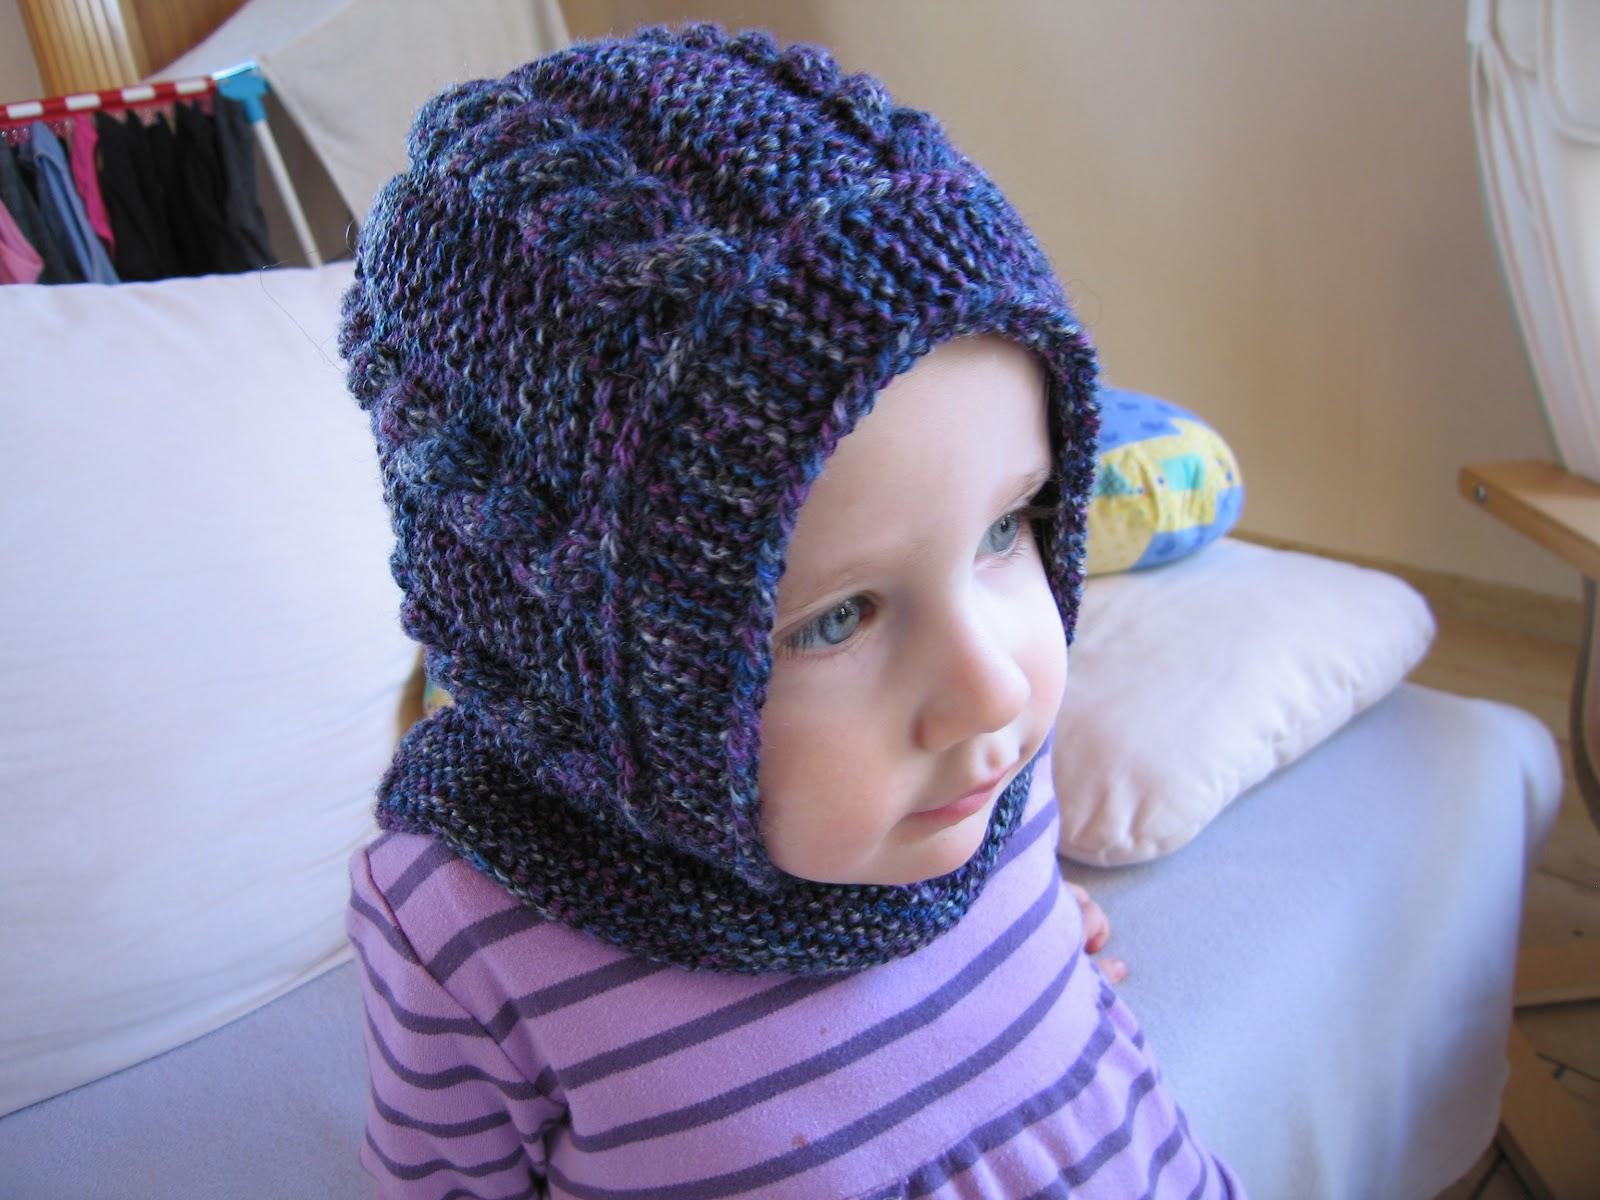 Шапка-шлем для девочки своими руками фото 613